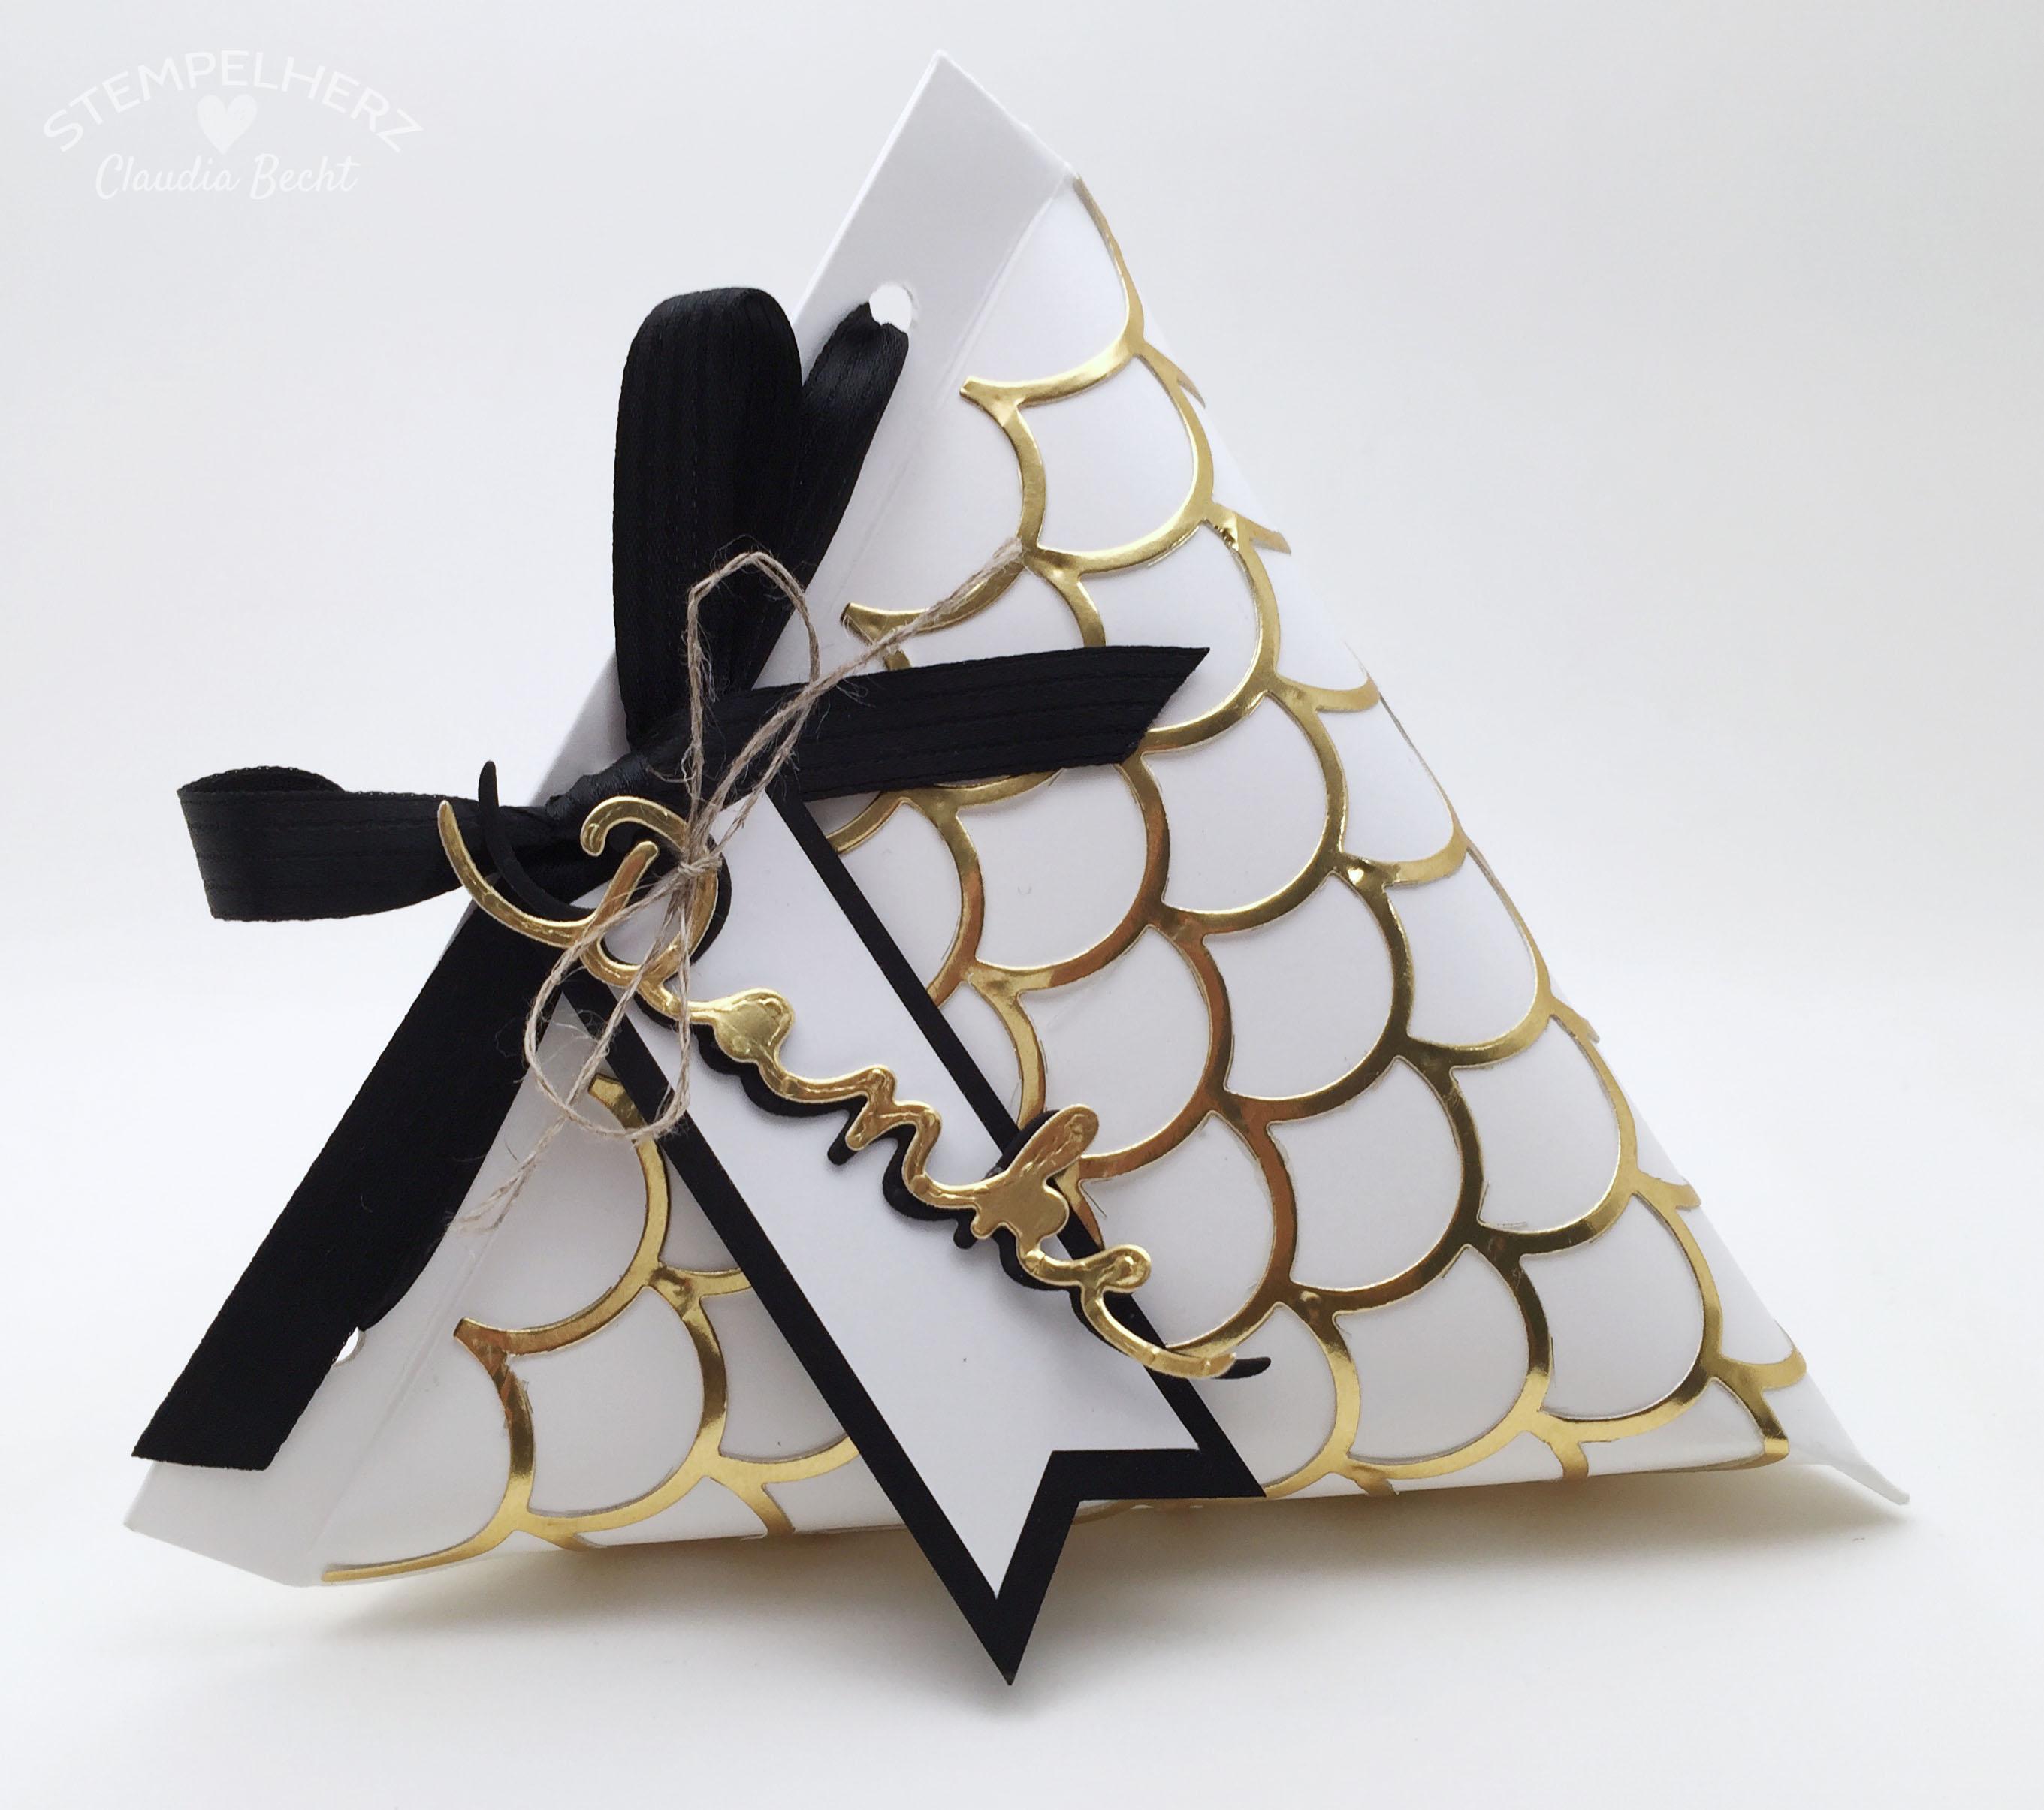 Stampin Up-Stempelherz-Verpackung-Box-Tetra Pak-Verpackung Danke Gold-Schwarz-Weiß 01b